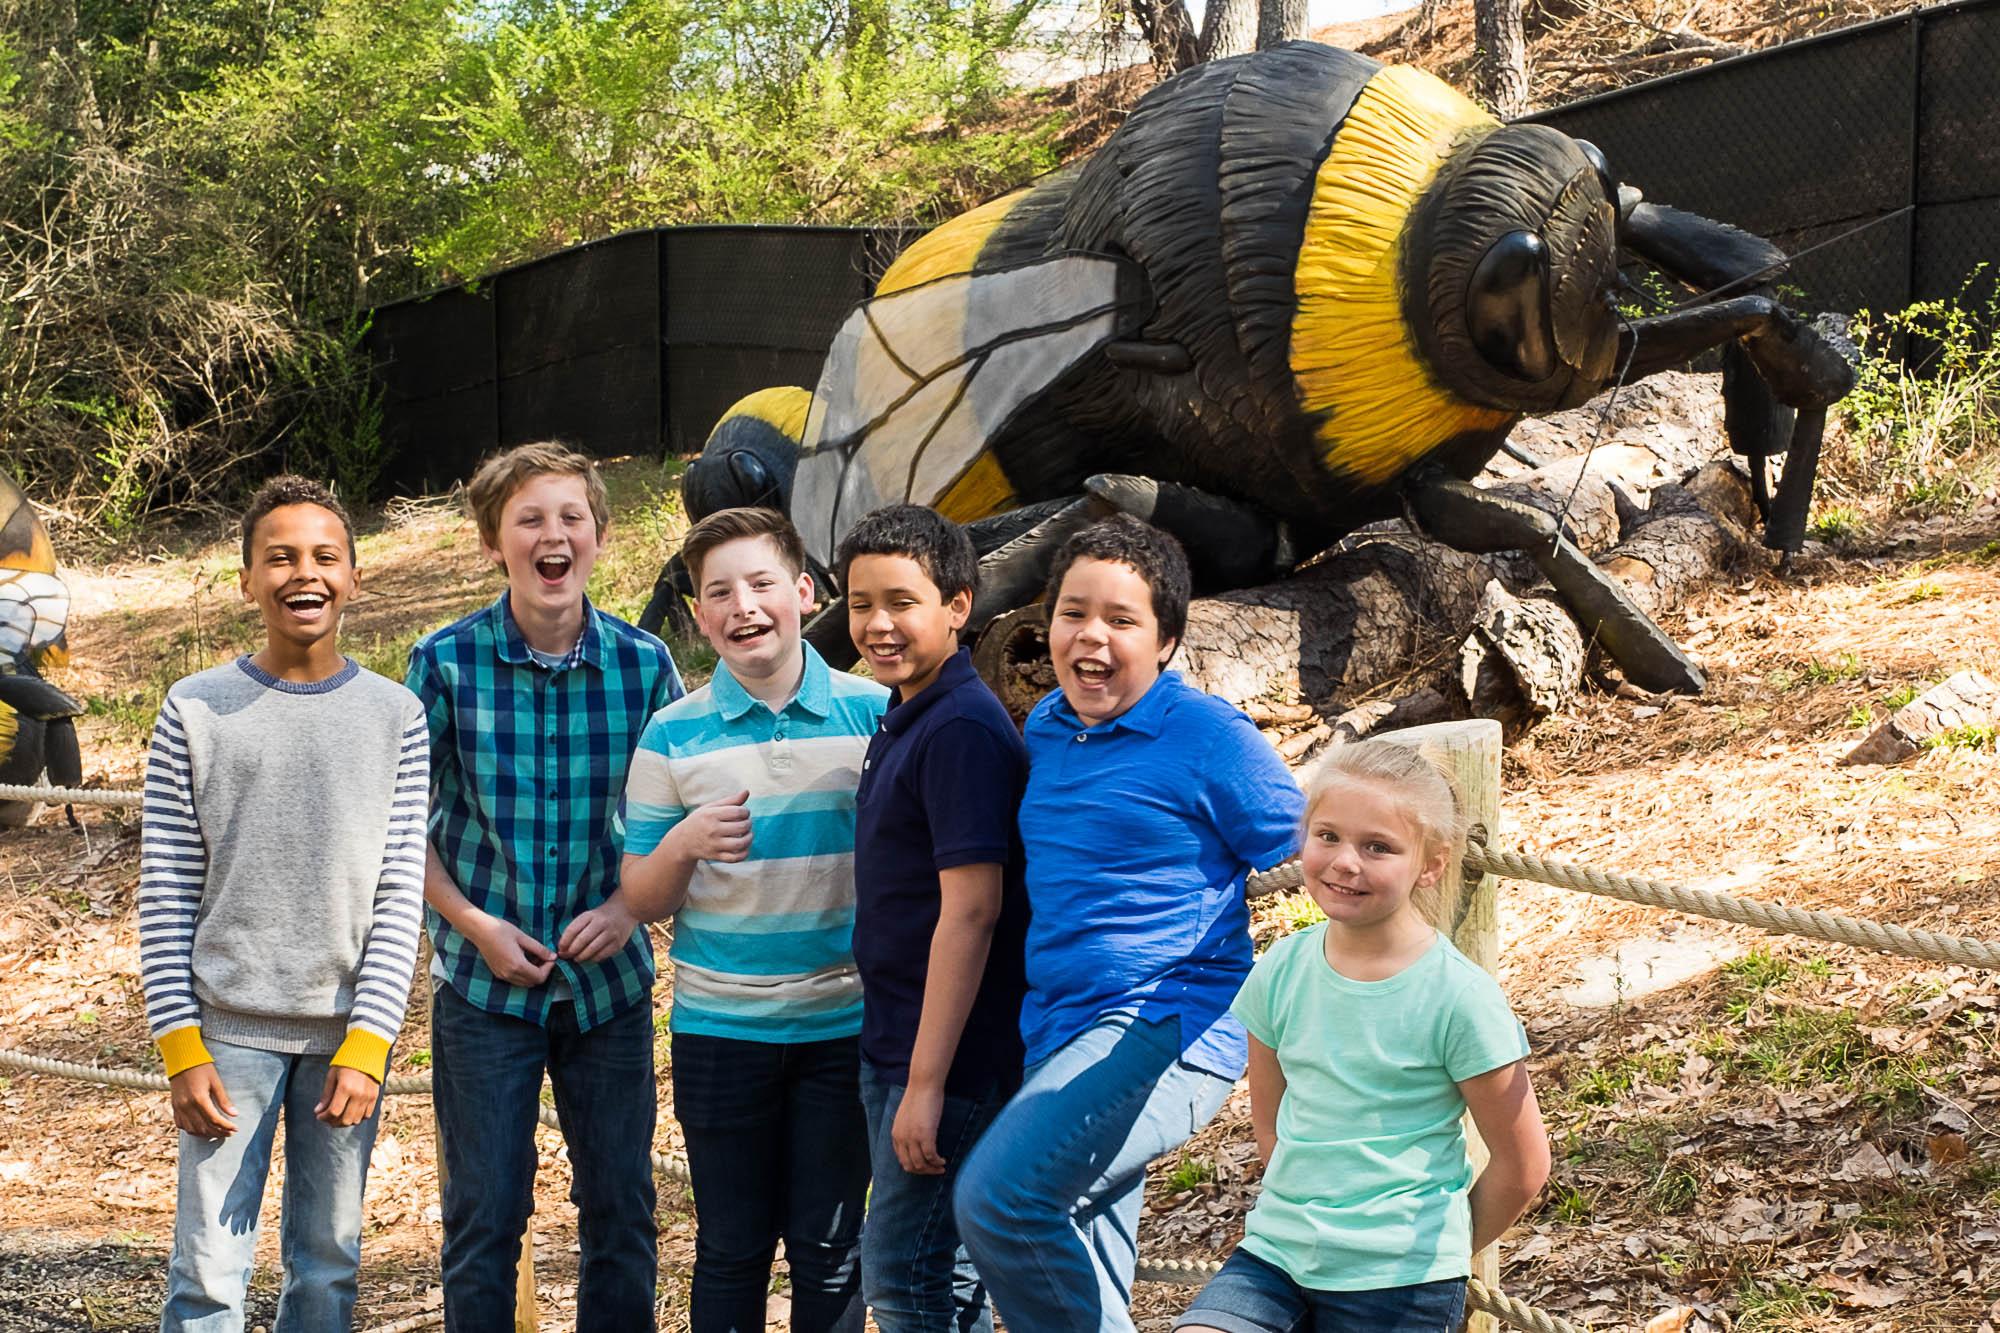 Summer Exhibit: MEGABUGS! Adventure Encounters at Stone Mountain Park in Atlanta